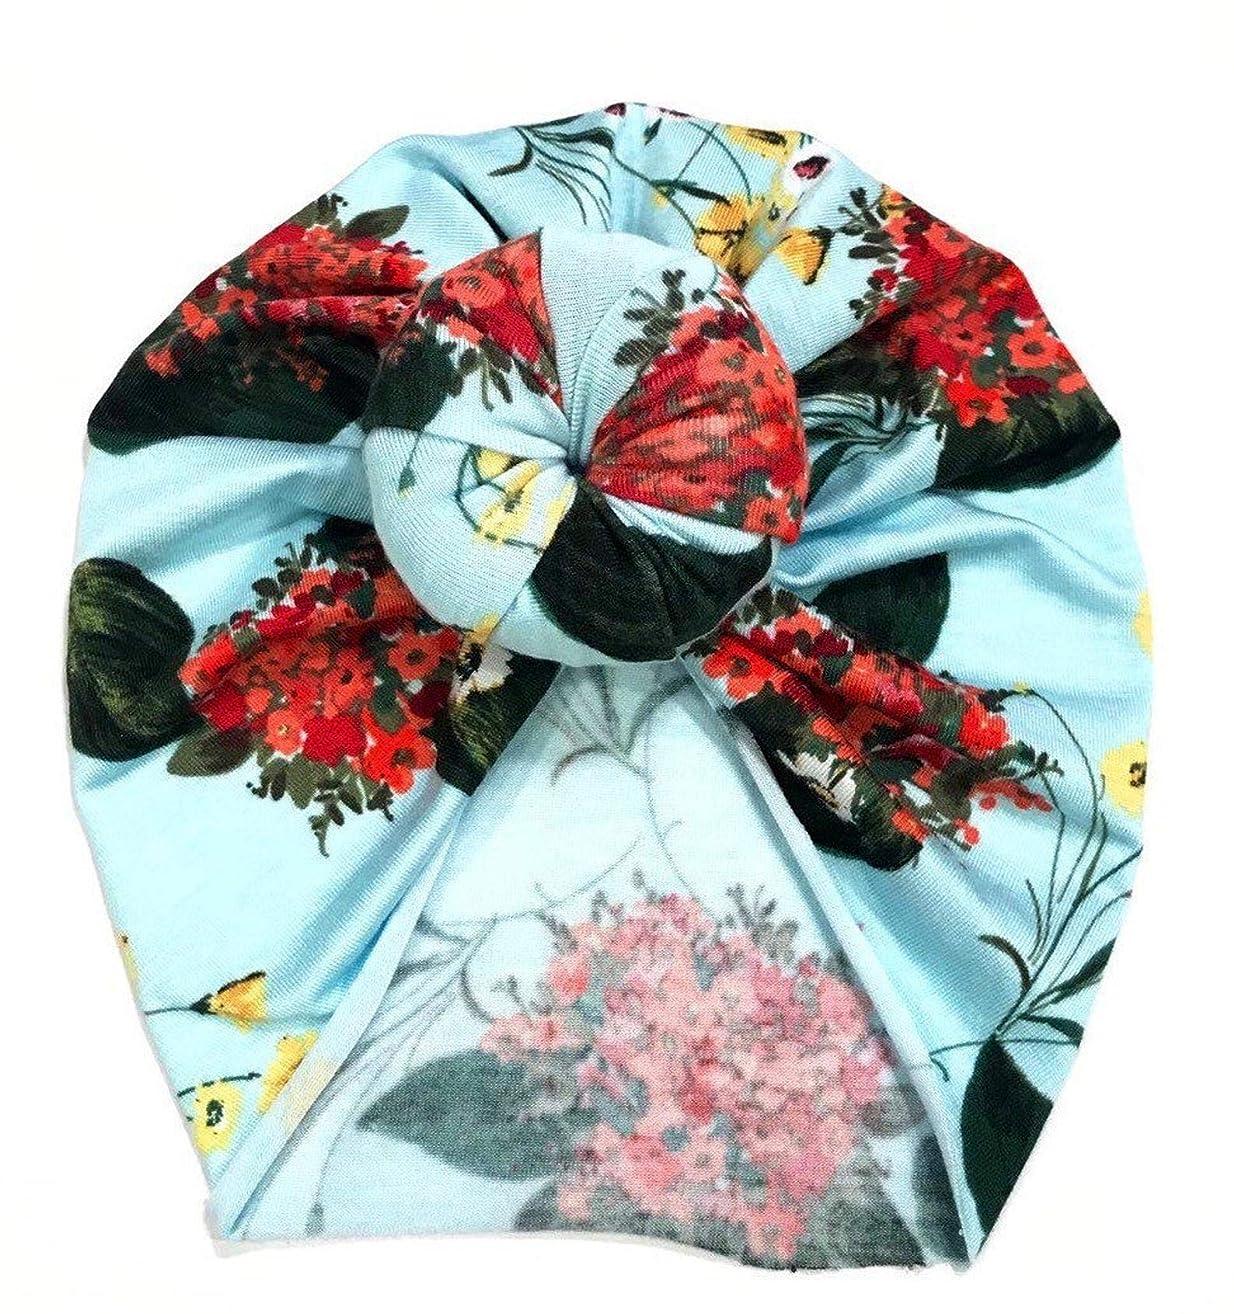 Headwrap Floral Spring/Summer Baby Turban |Baby Turban|Adult Turban|Top Knot Turban|Top Knot Baby Hat|Kids Turbans|Toddler Turban|Newborn Turban